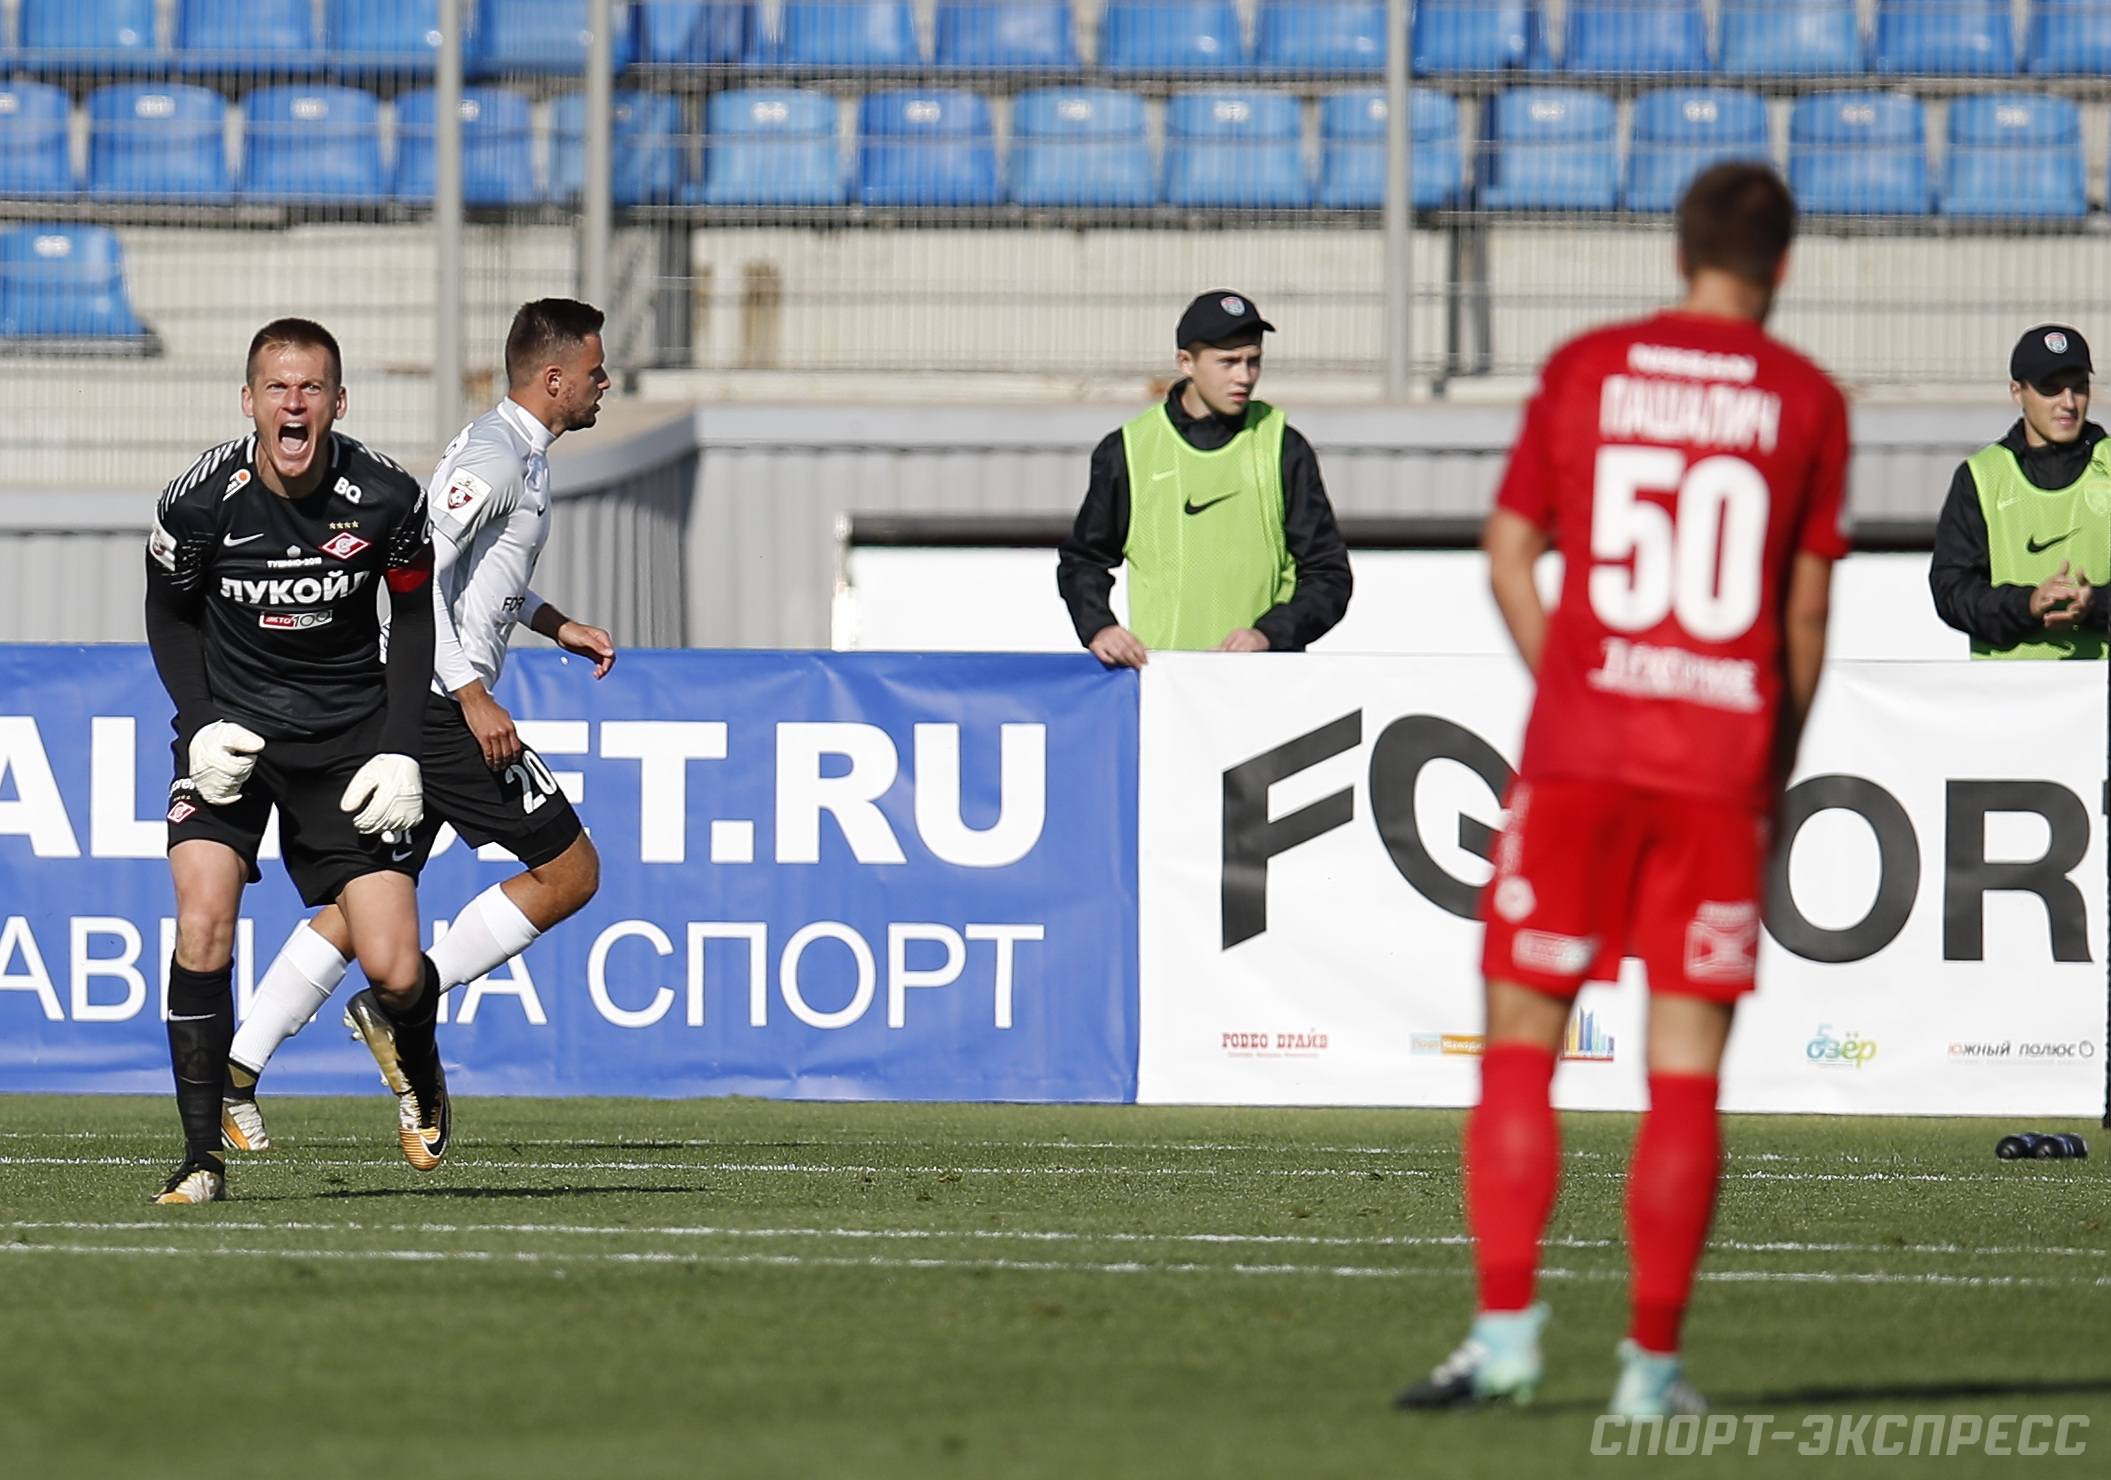 Динамо Москва – Спартак-2 Москва прогноз на встречу ФНЛ